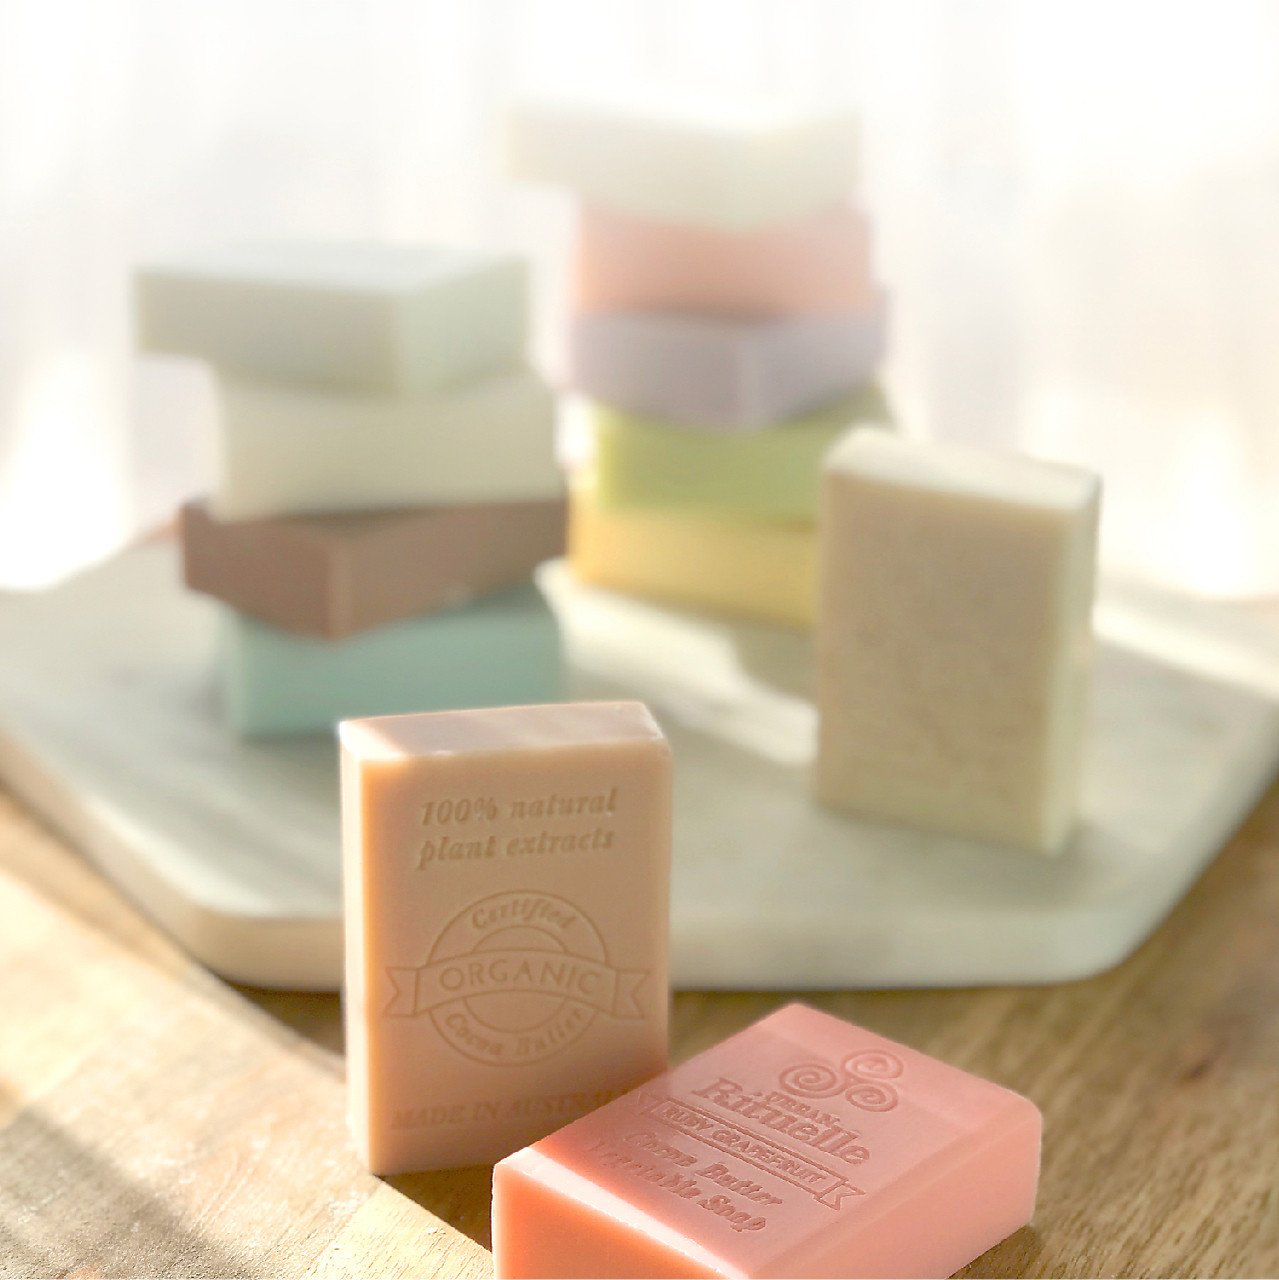 Organic Cocoa Butter Vegetable Soap - Urban Rituelle